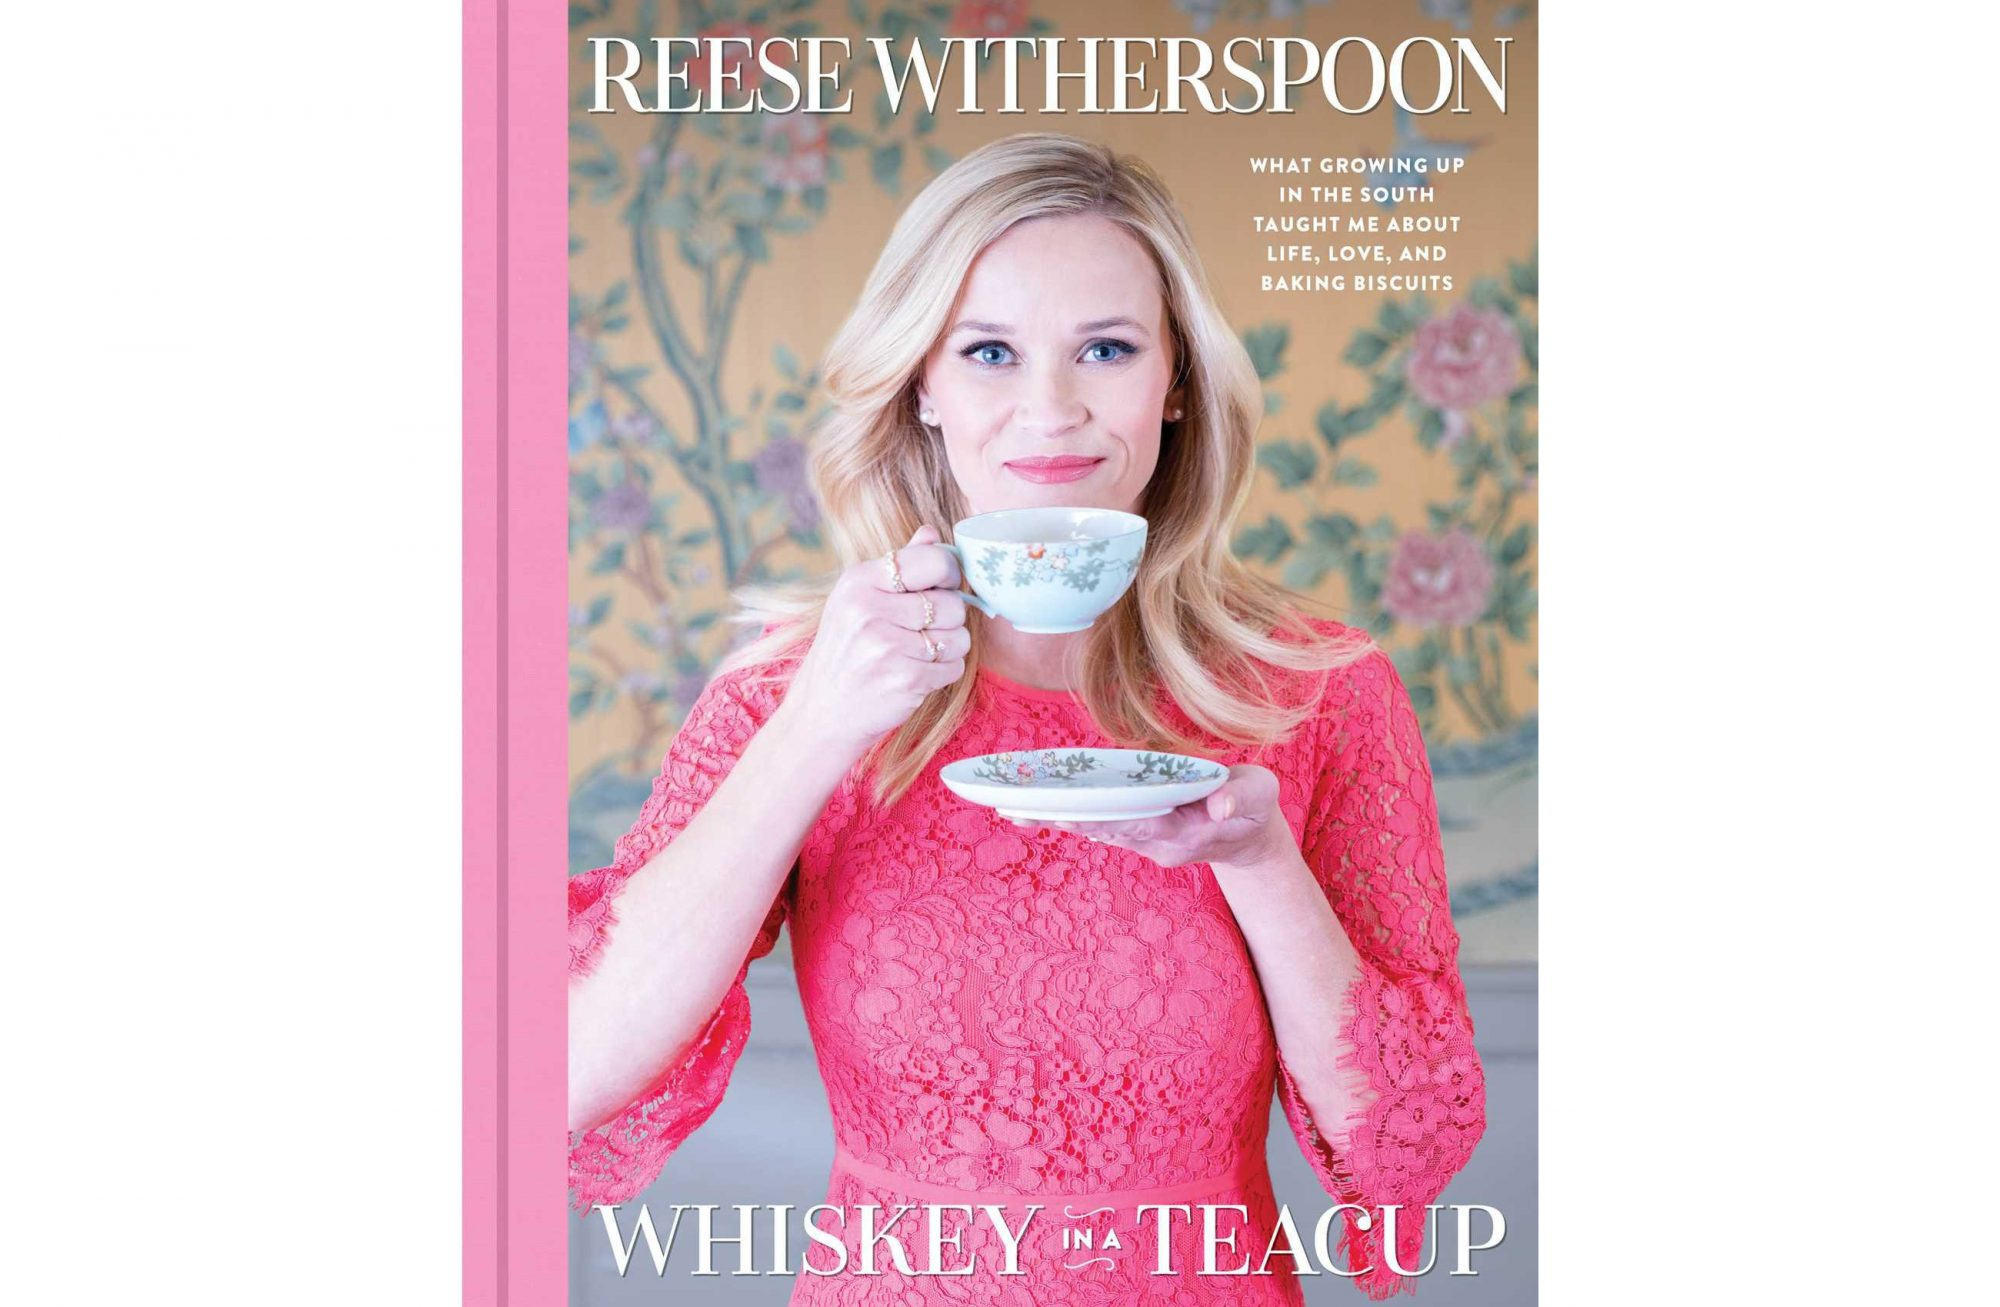 whiskeyinateacup.jpg